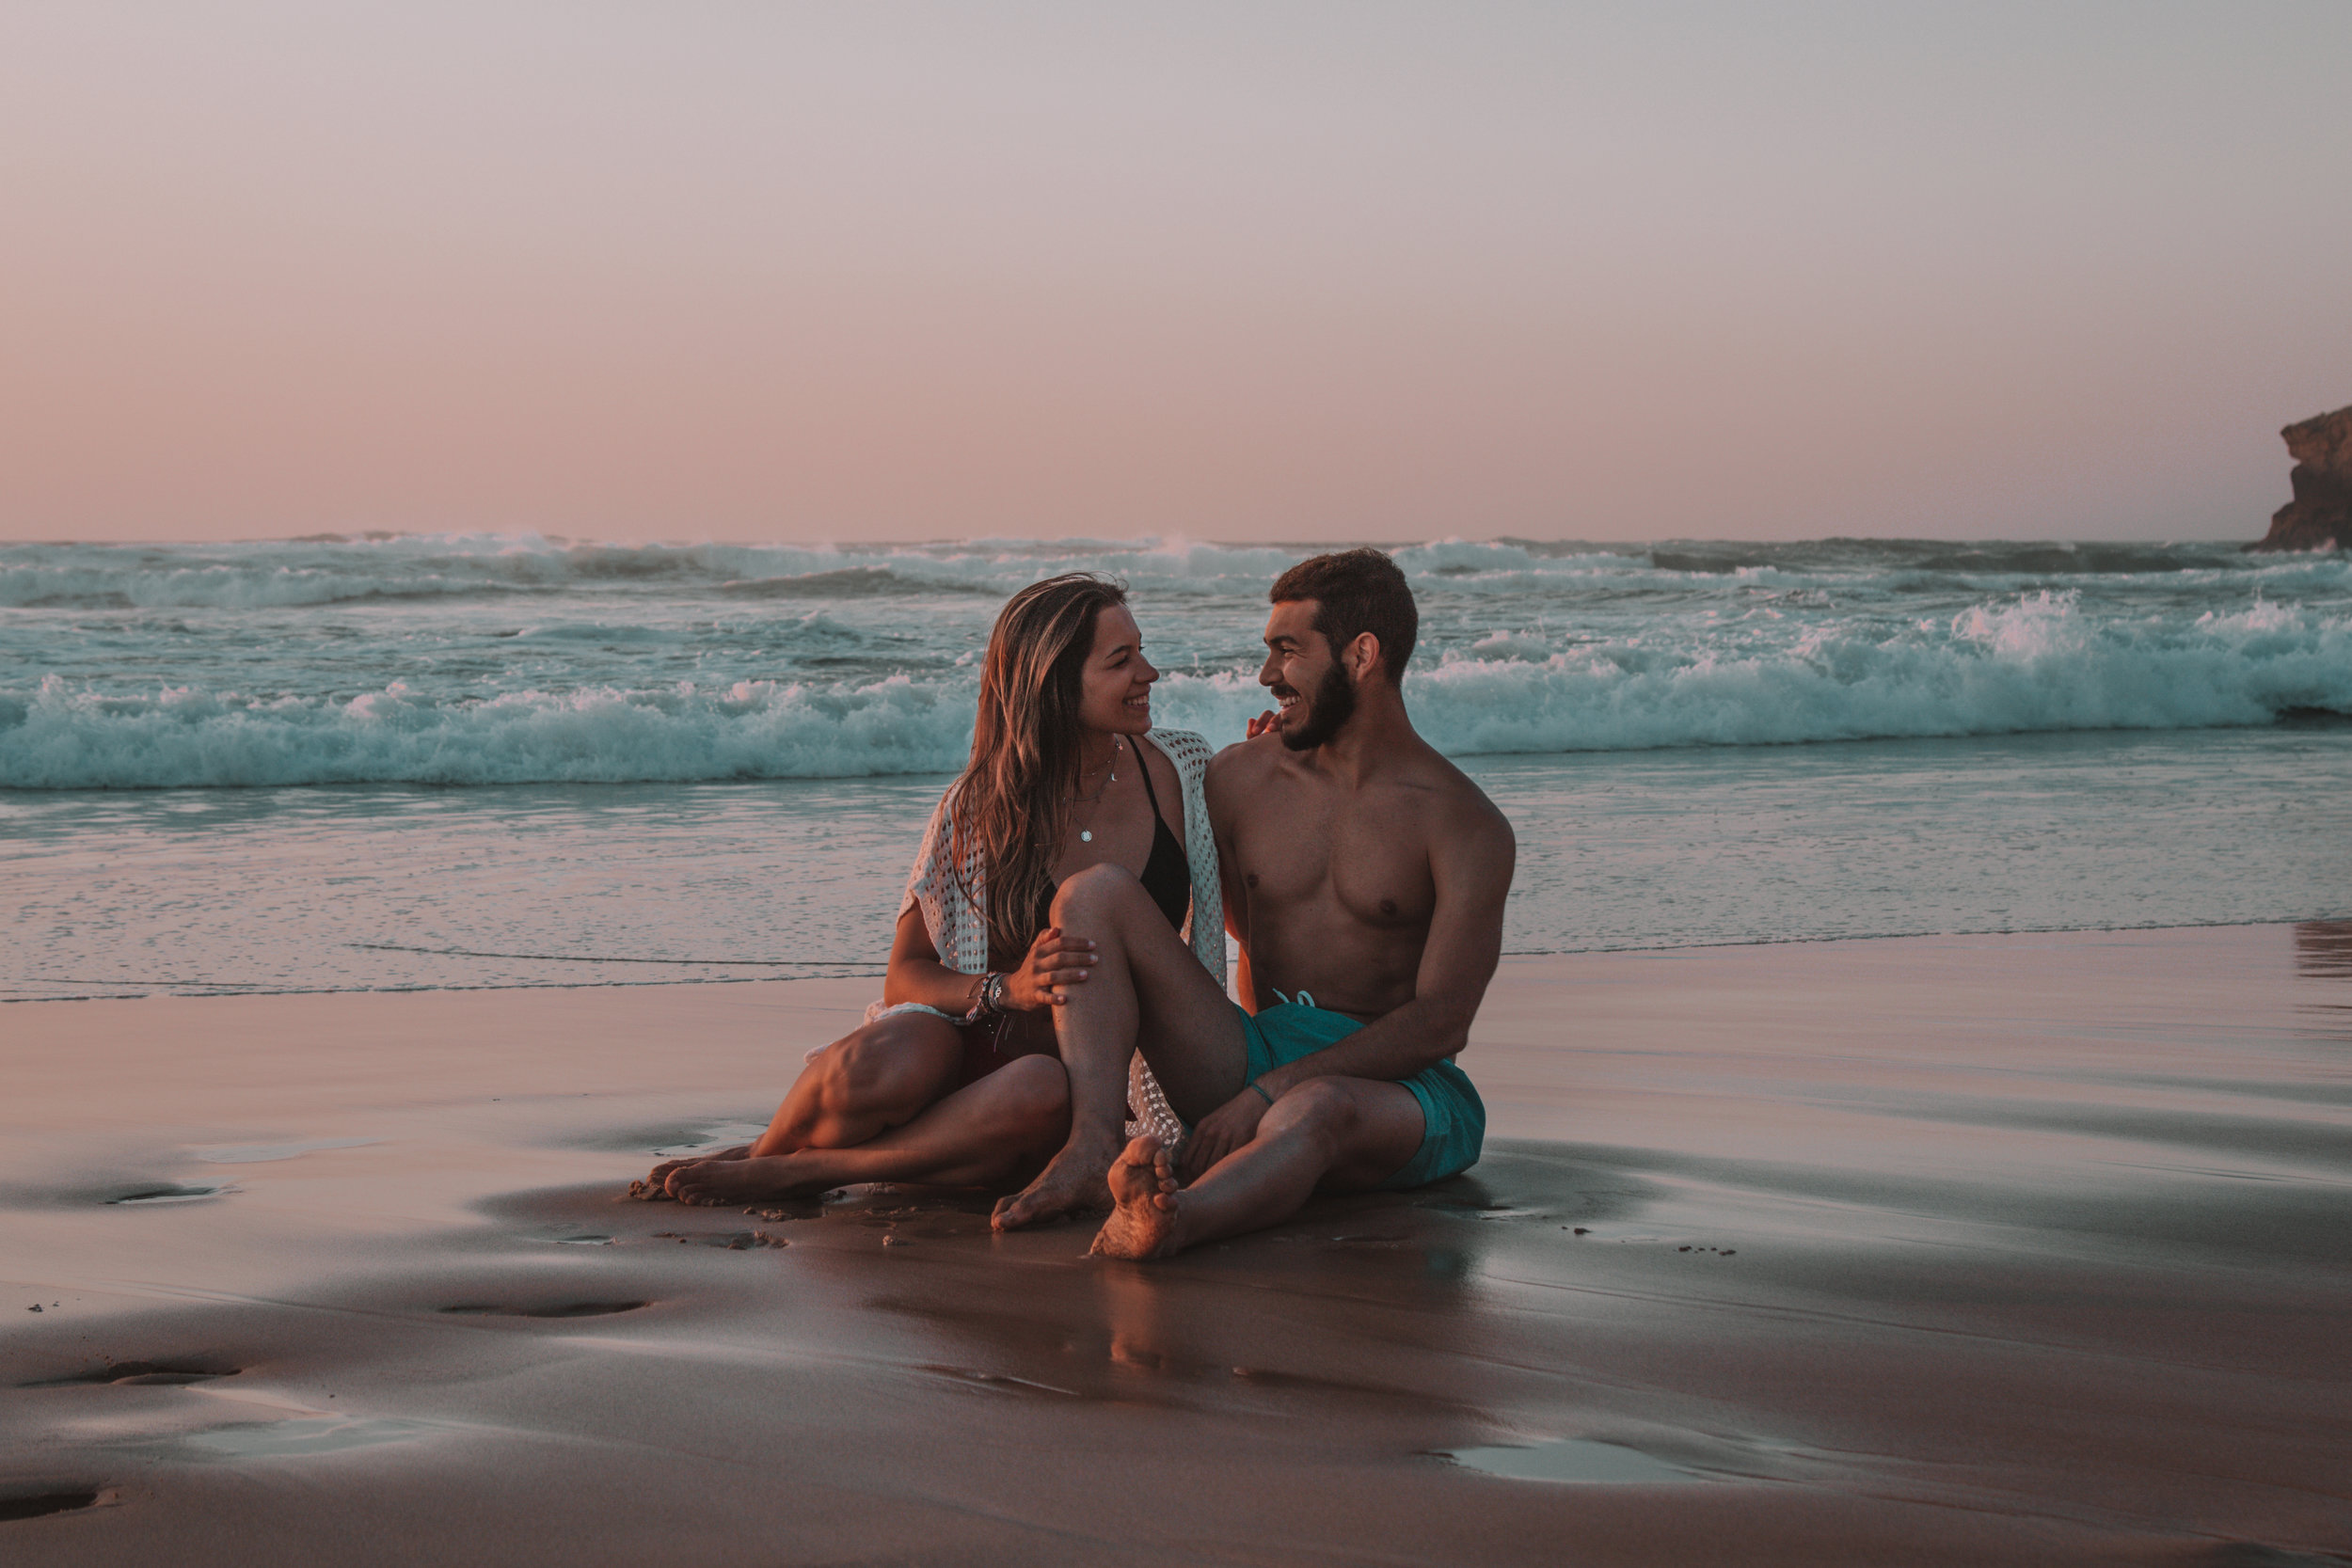 freeoversea praia monte clerigo algarve portugal